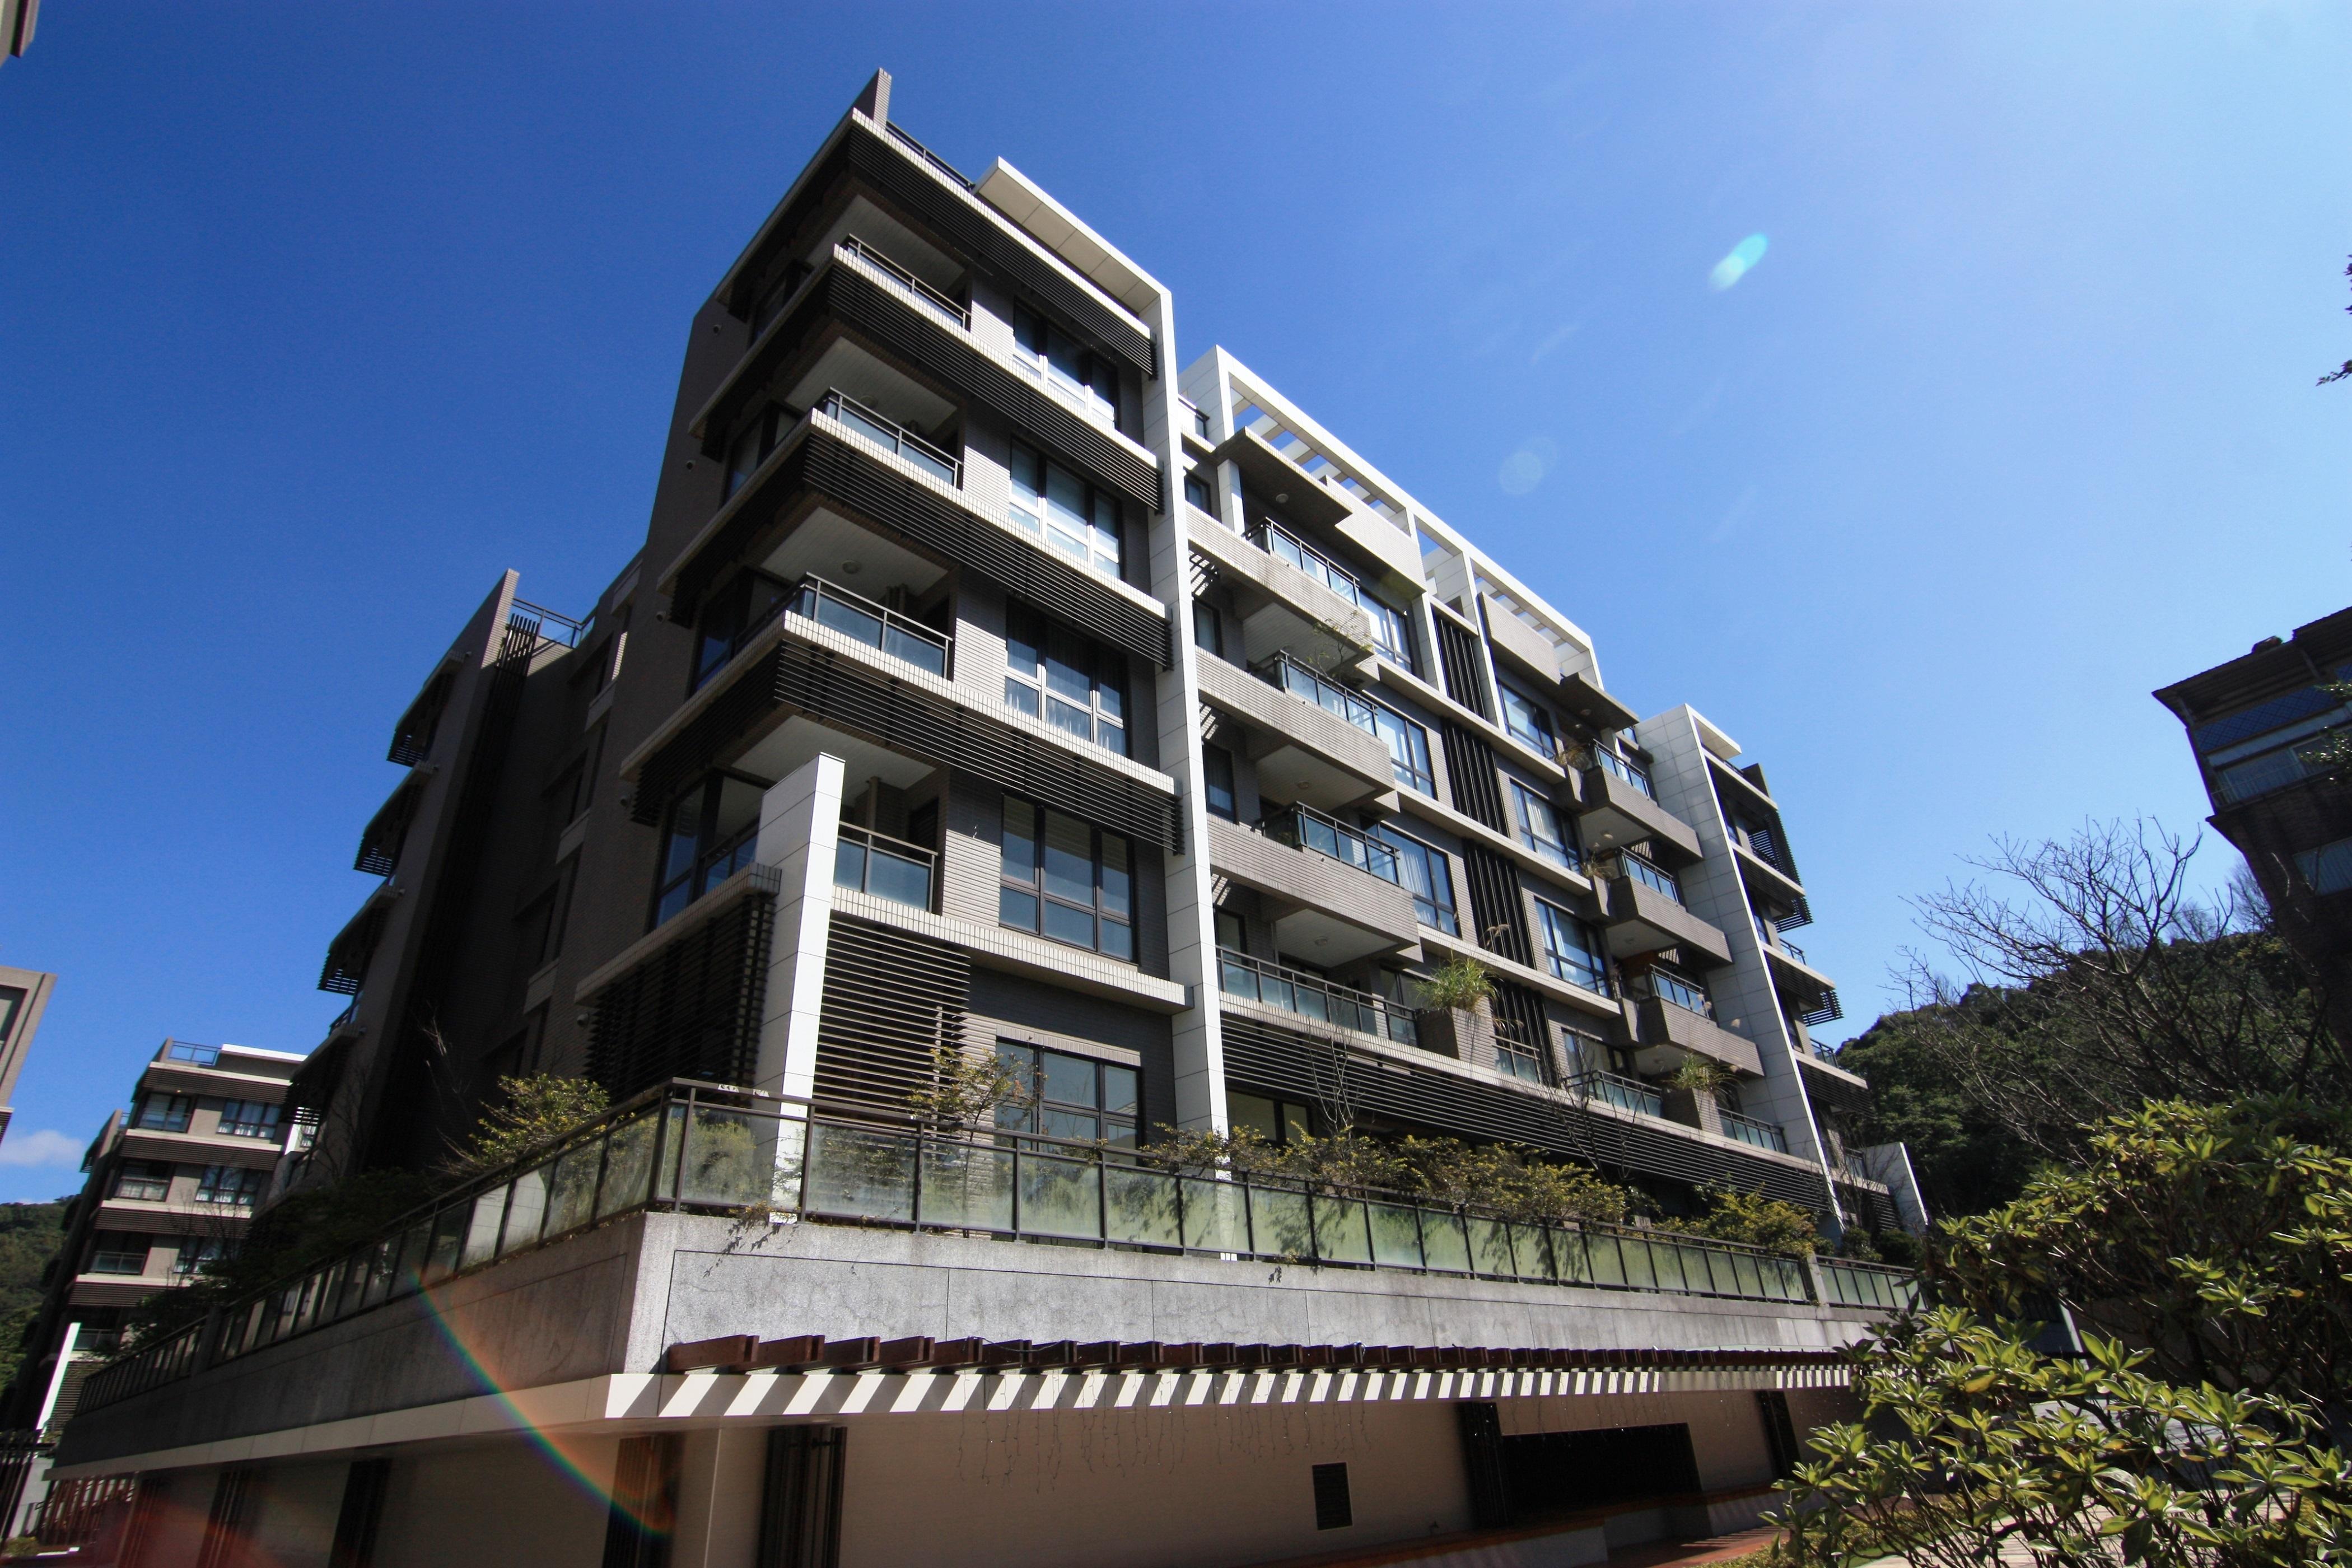 Apartamento por un Venta en The Emperor-Park 2 Jingshan Rd., Shilin Dist. Taipei City, 111 Taiwan